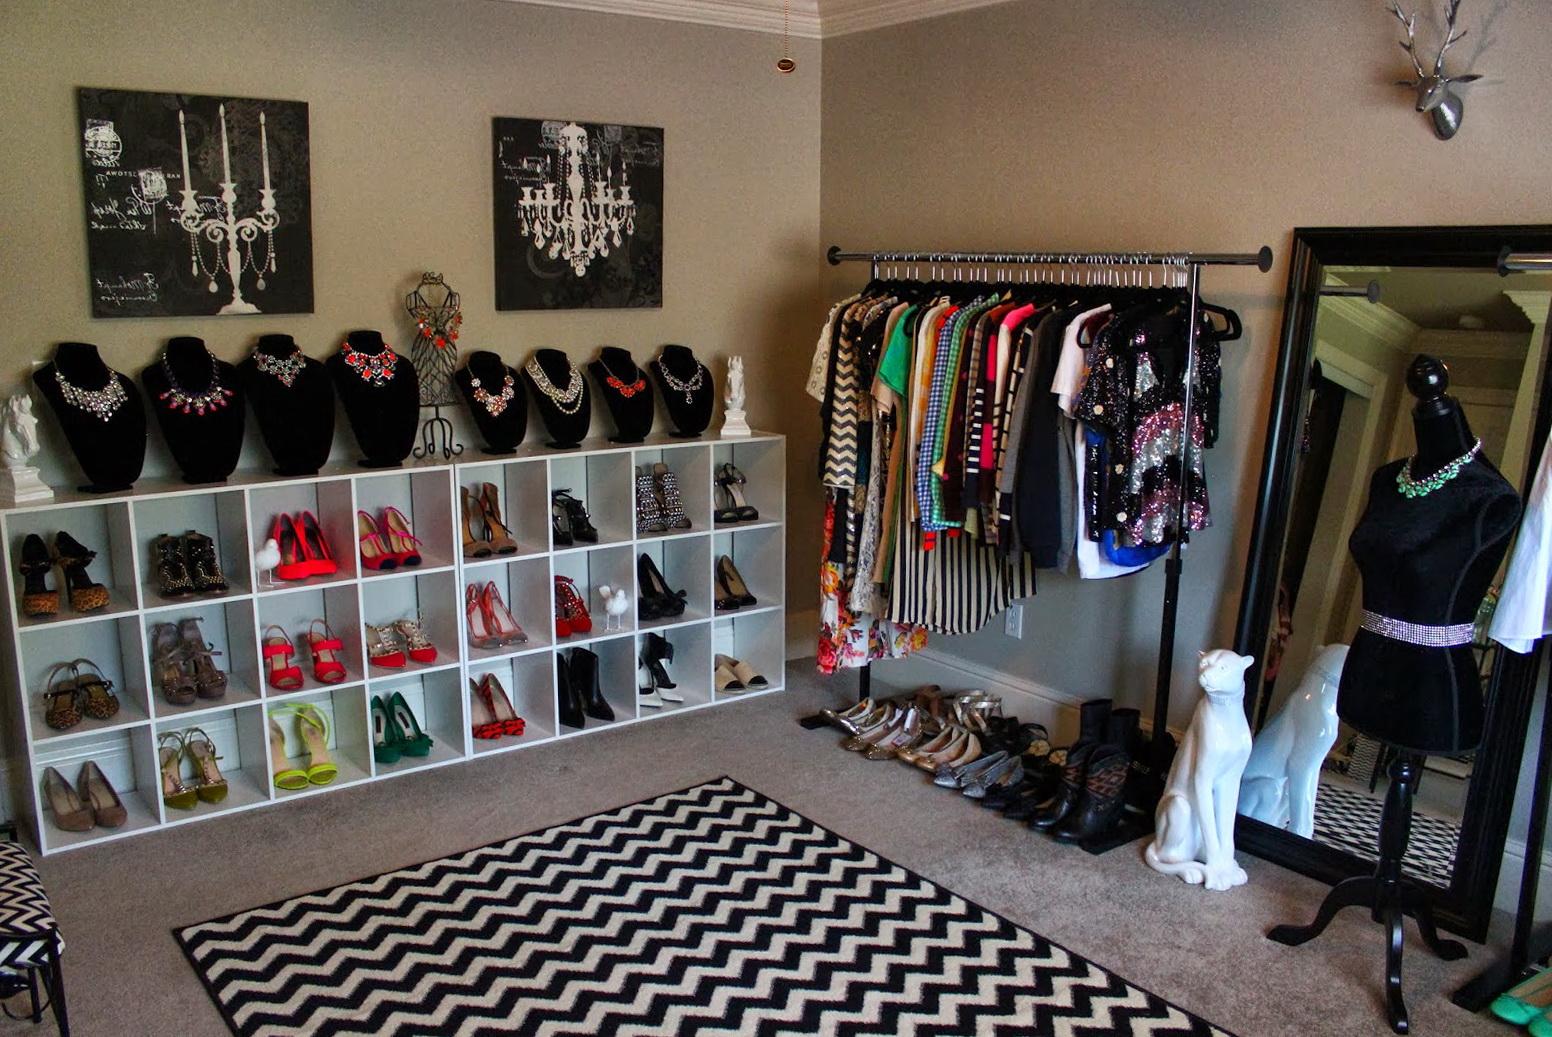 Turning A Bedroom Into A Closet Ideas   Home Design Ideas